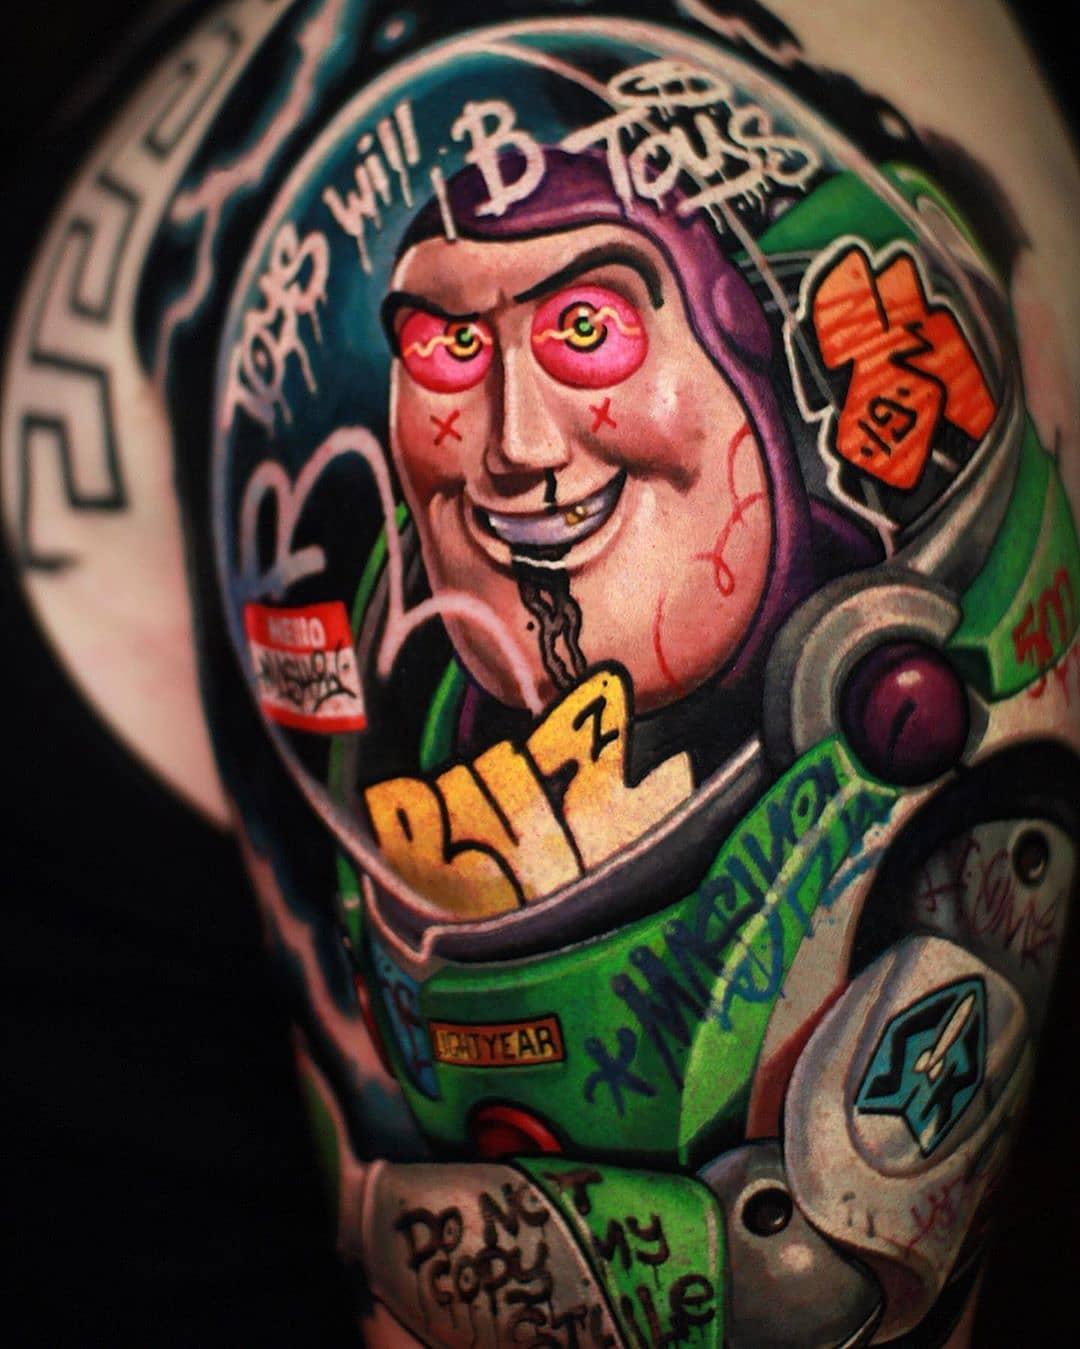 25 graffiti tattoos that celebrate street art and style